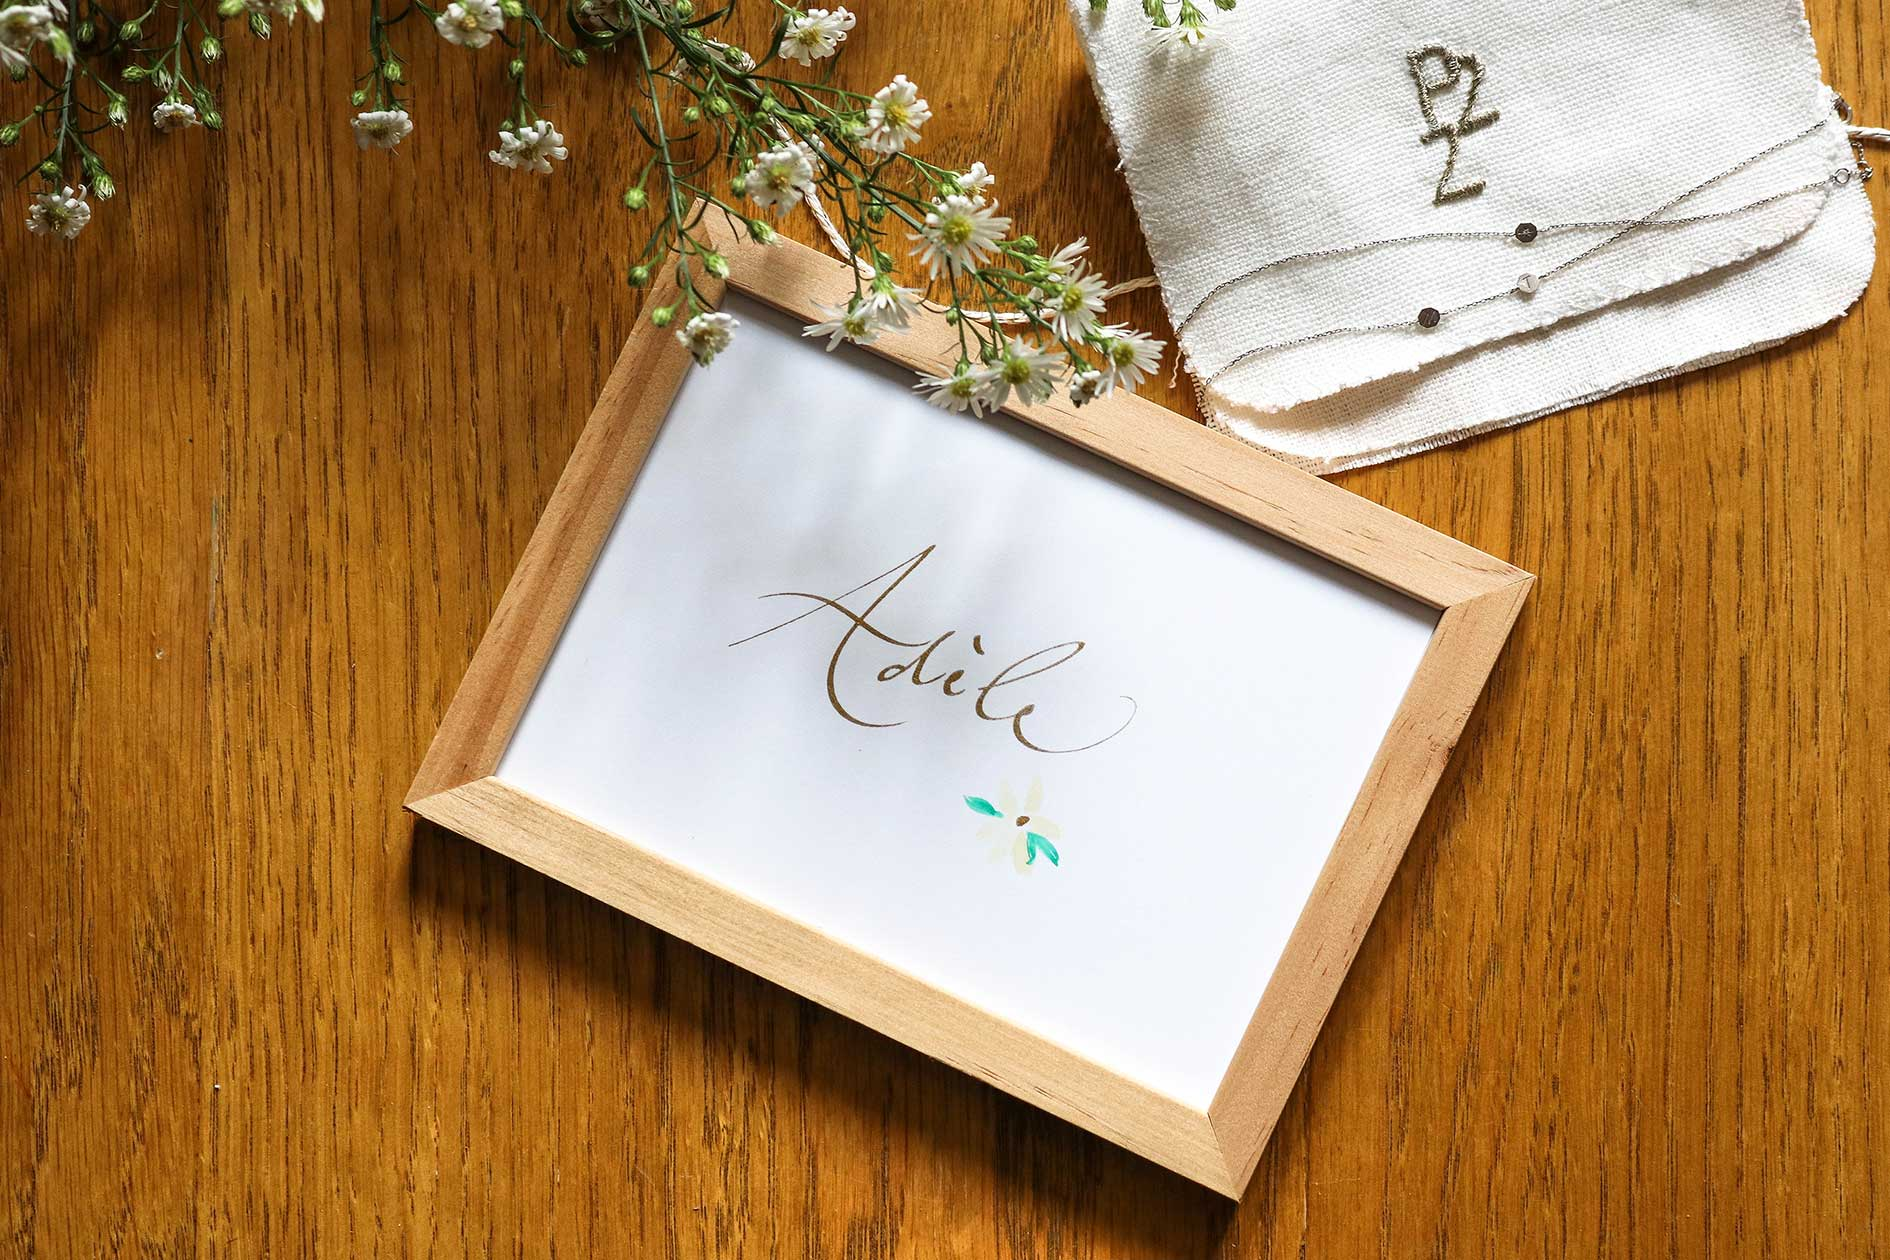 Ralanto-studio-calligraphie-poincon-22_Carte-Adele.jpg